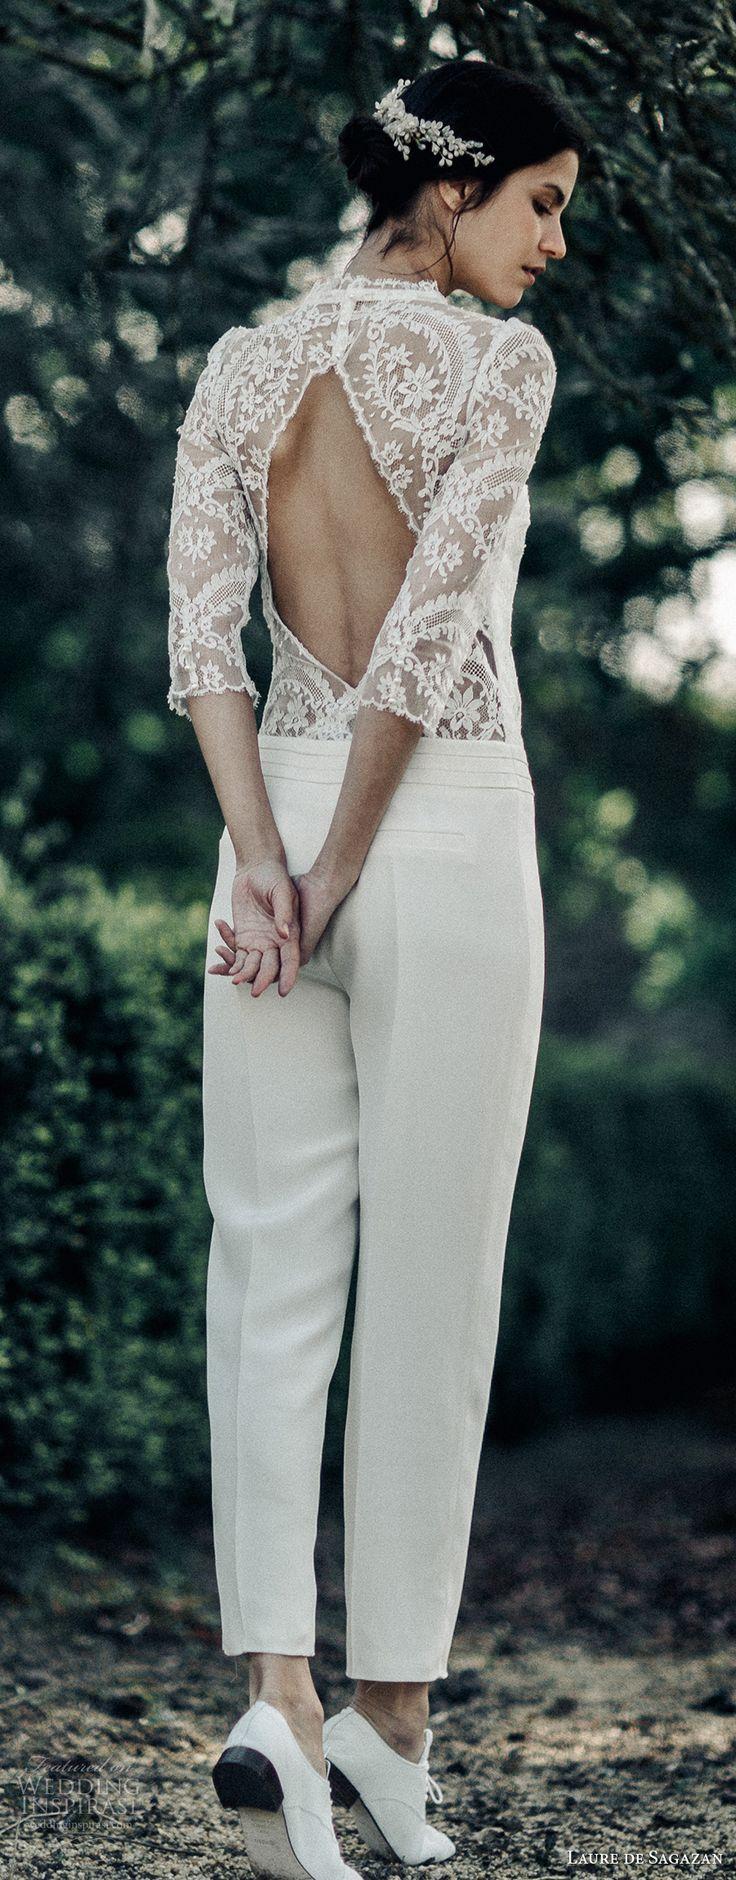 laure de sagazan 2017 bridal three quarter sleeves jewel straight across neck bohemian jumpsuit wedding dress keyhole back (wagner) bv -- Laure de Sagazan 2017 Wedding Dresses